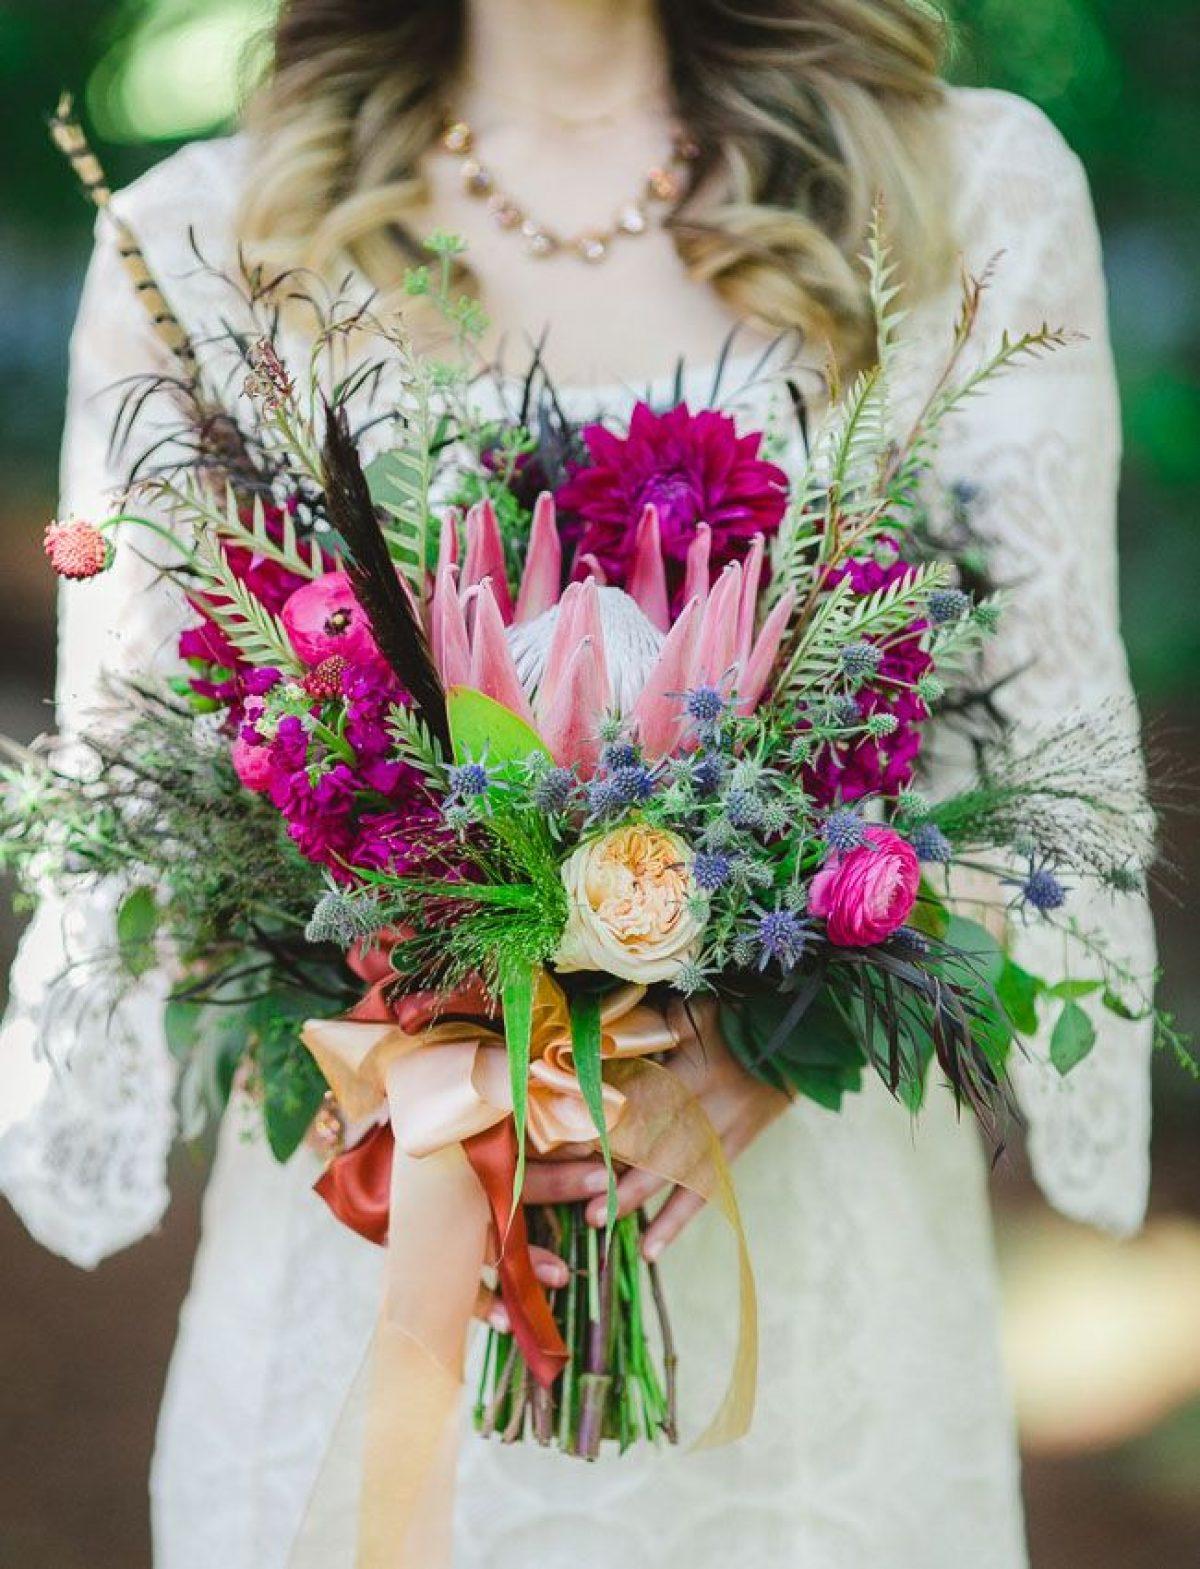 Buquê de flores exóticas como protea, rosa inglesa e camélias